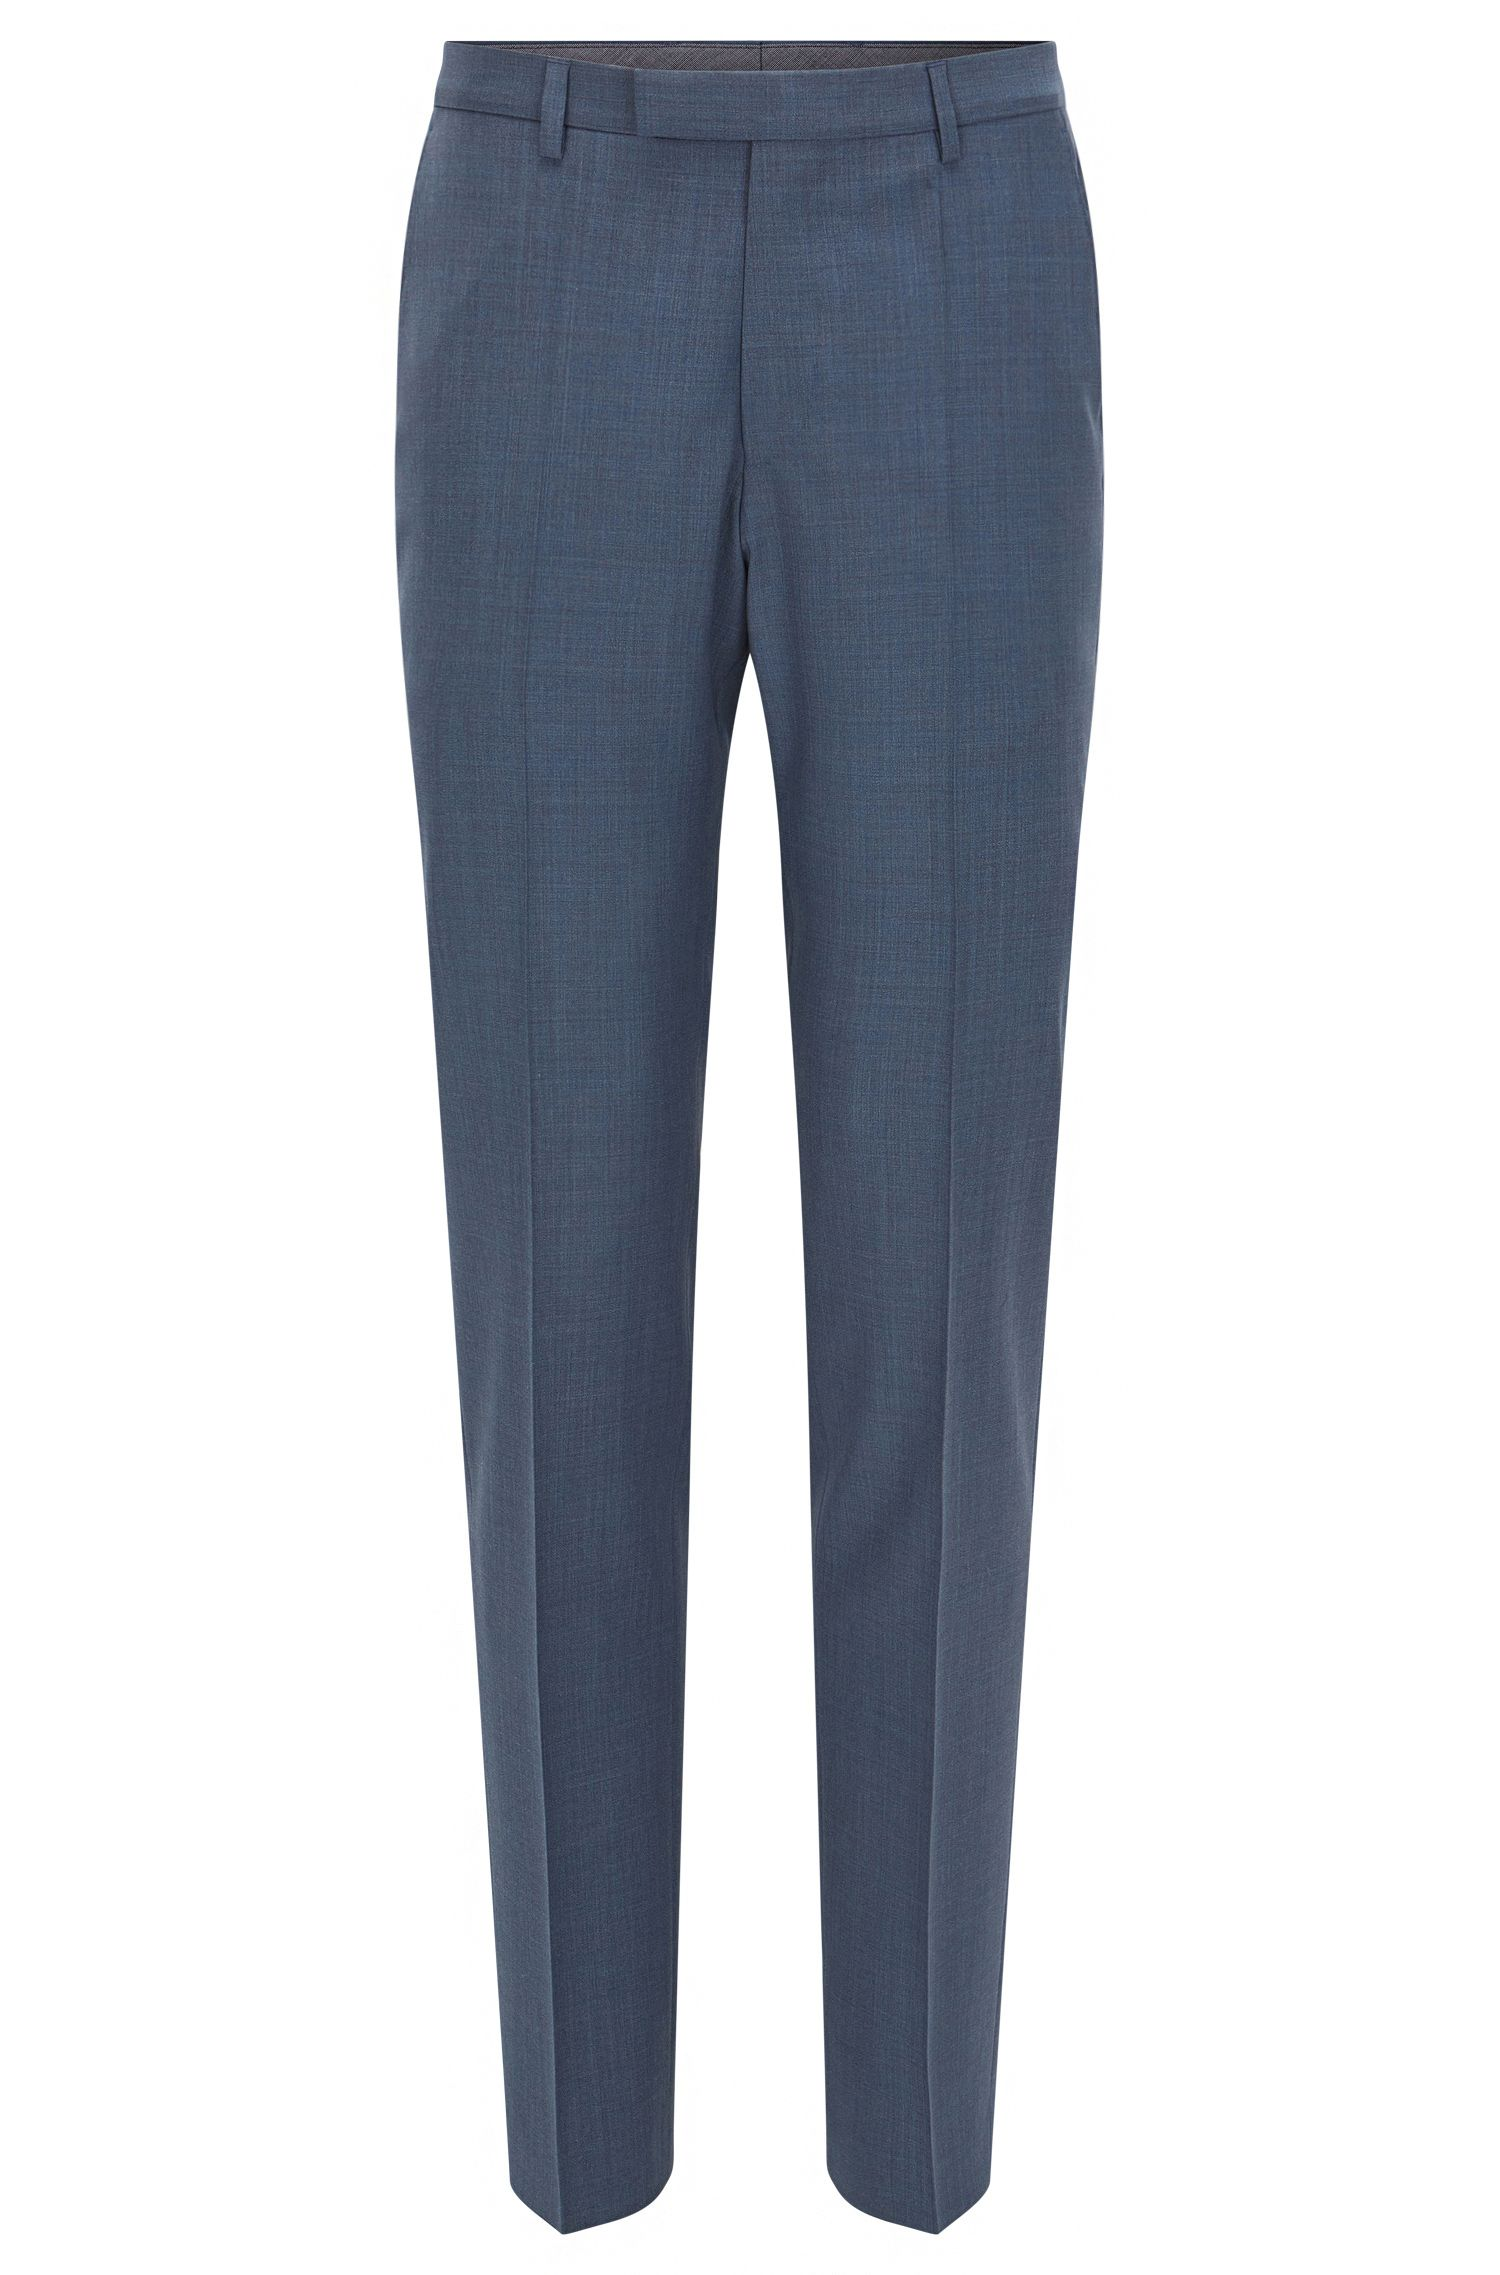 Pantalón regular fit de lana con porcentaje de cachemira